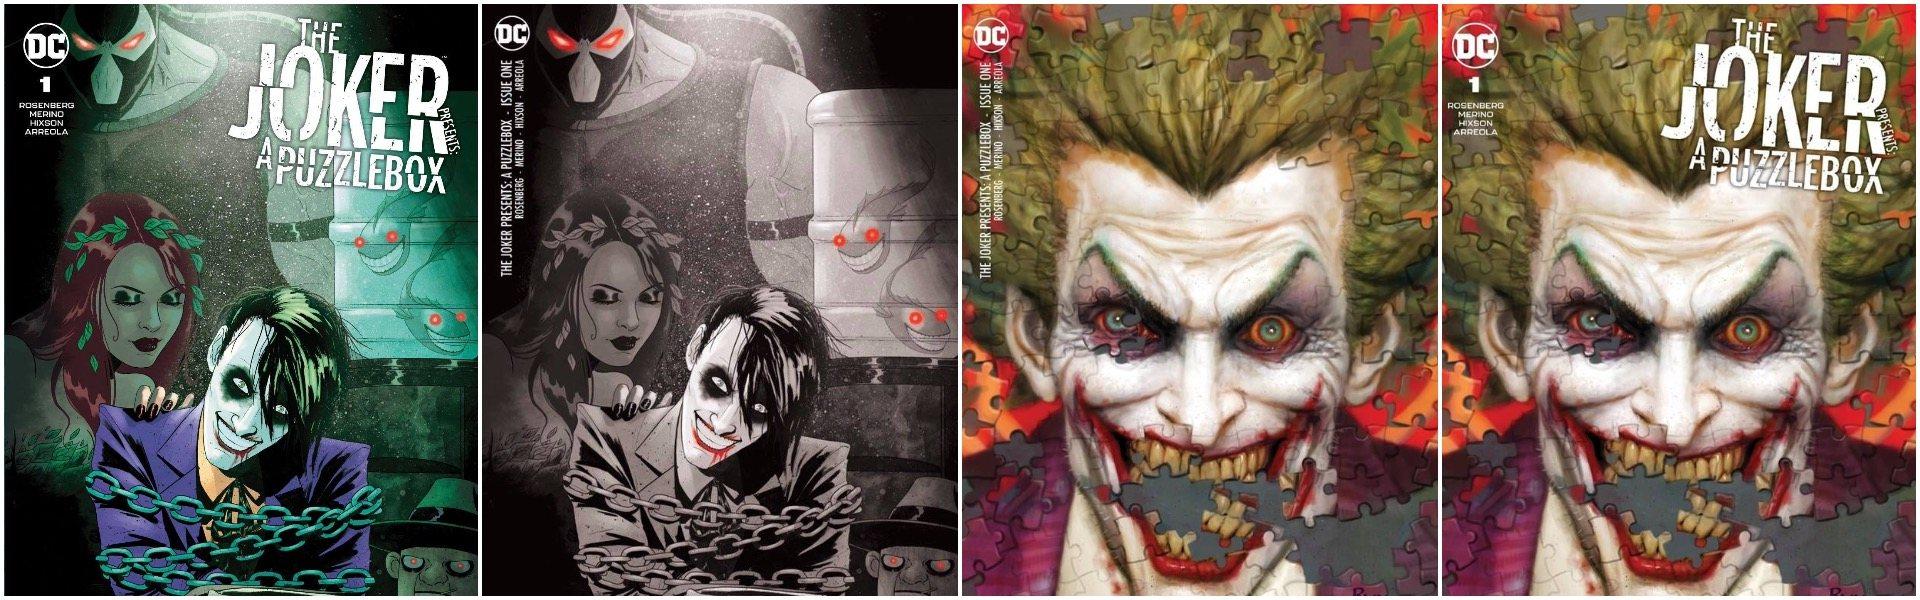 Joker Puzzlebox Exclusives!